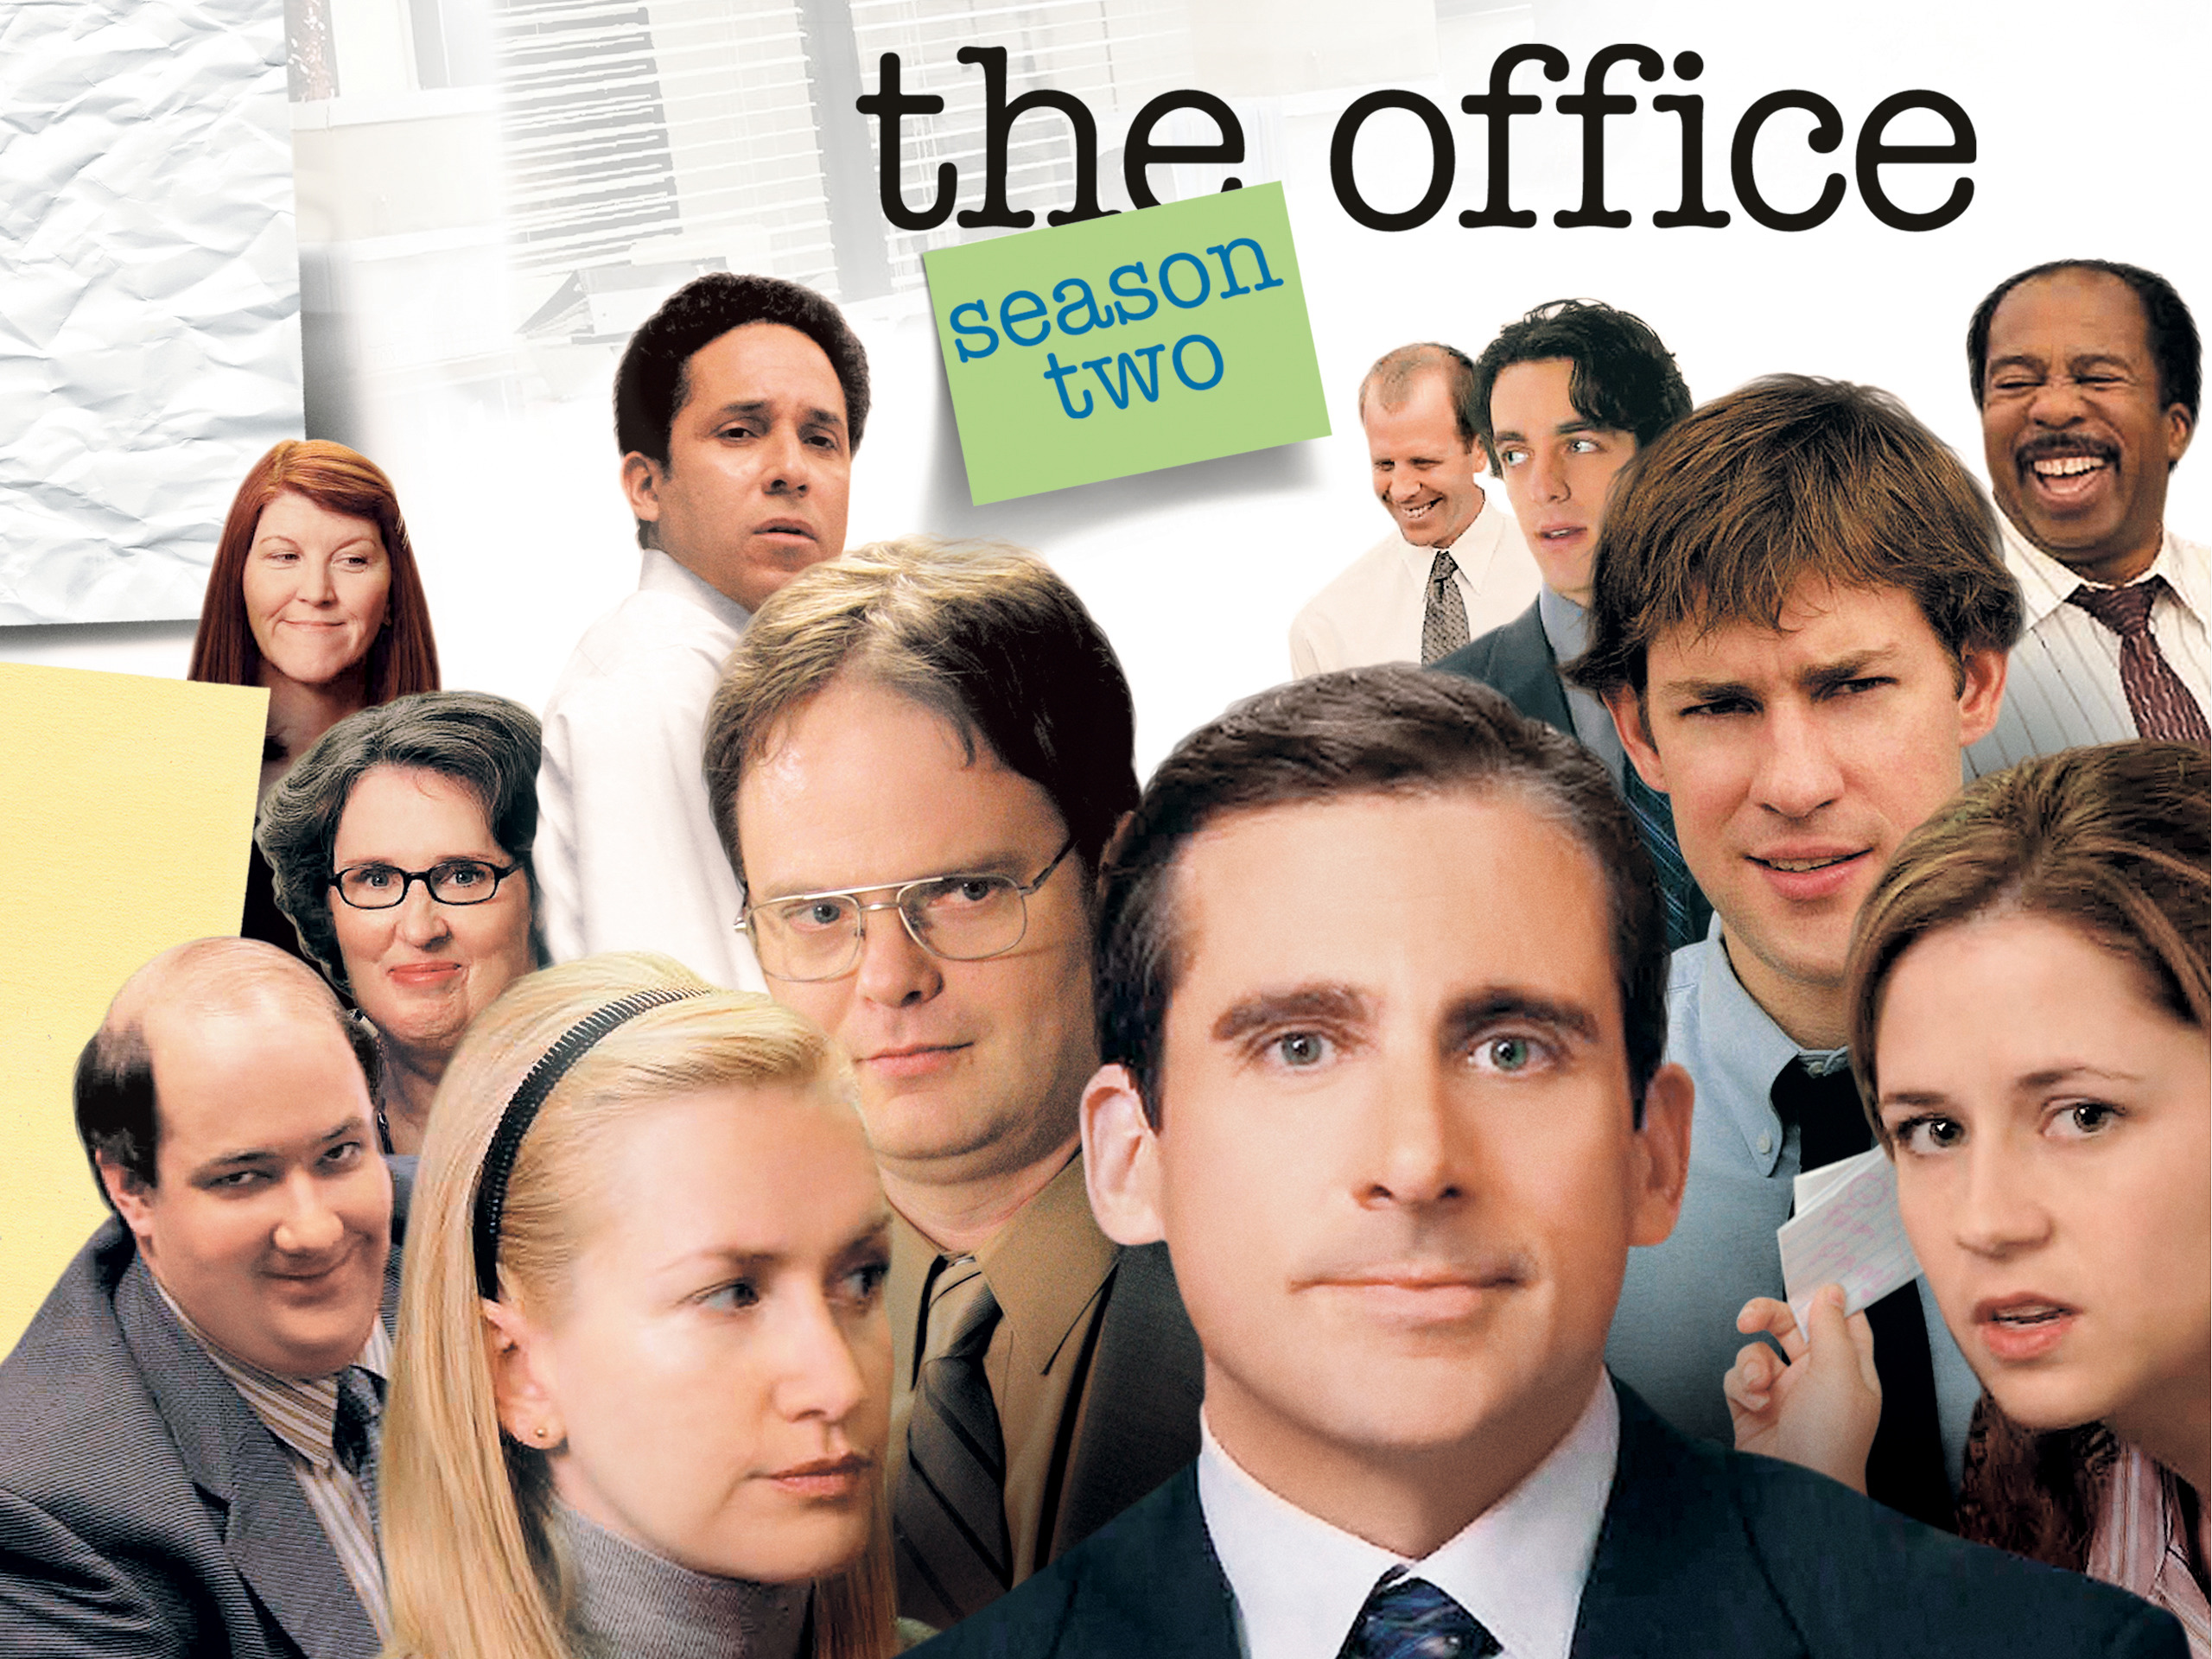 دانلود سریال دفتر – The Office (فصل دوم)